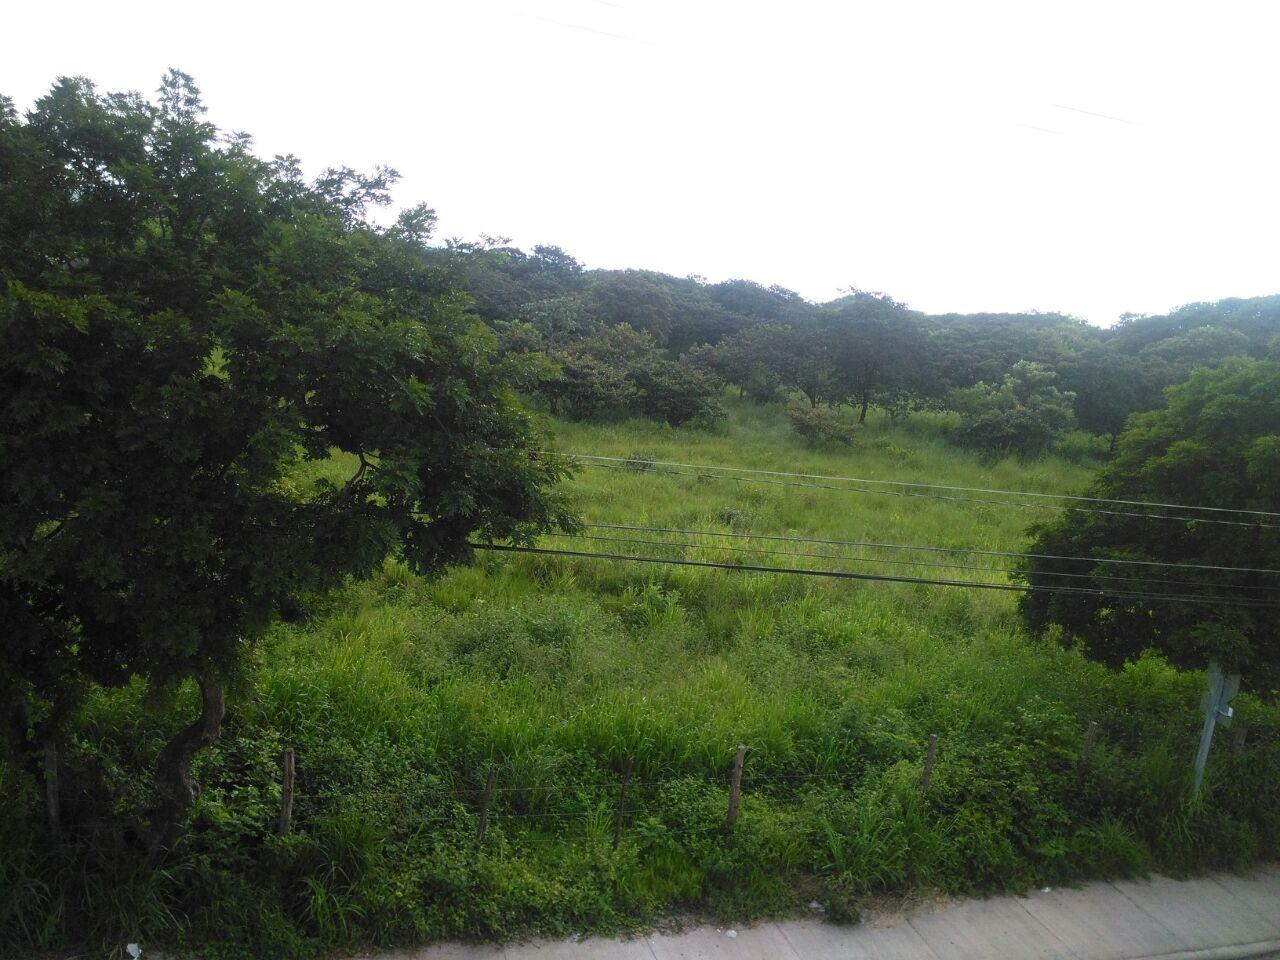 2435 Lote Comercial de 23.300m2 en Liberia